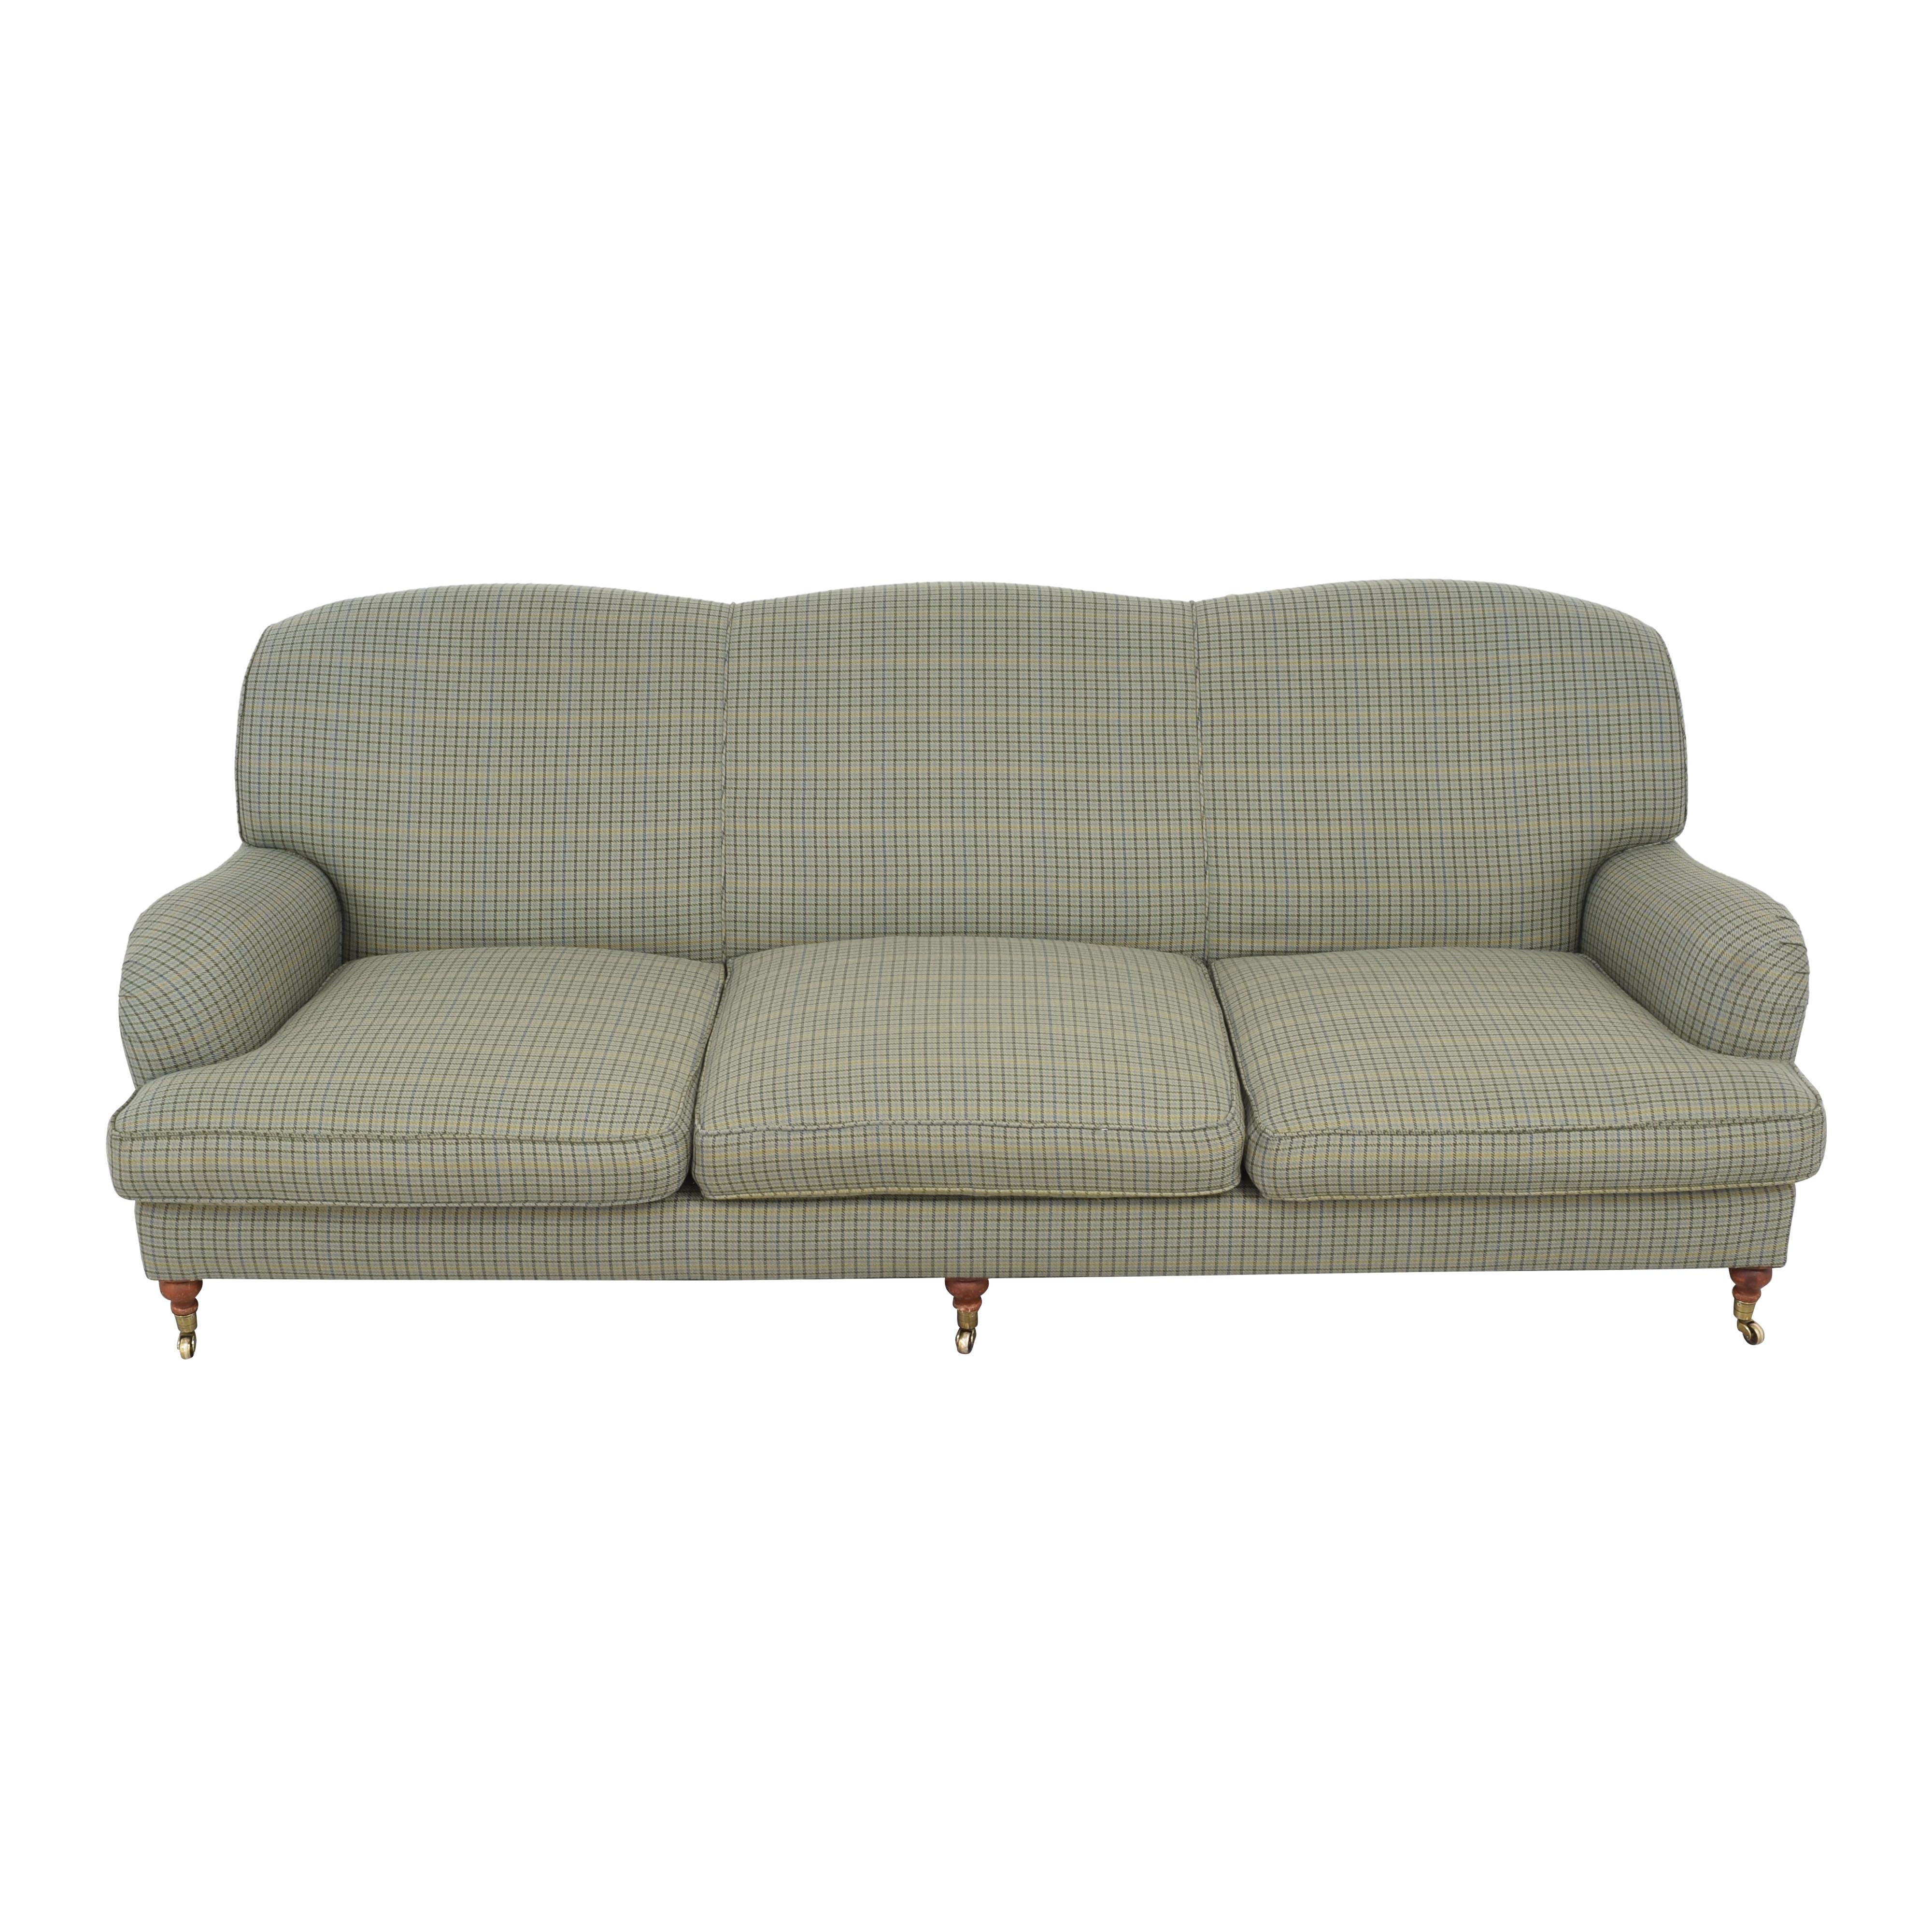 Ralph Lauren Home English Roll Arm Sofa / Sofas